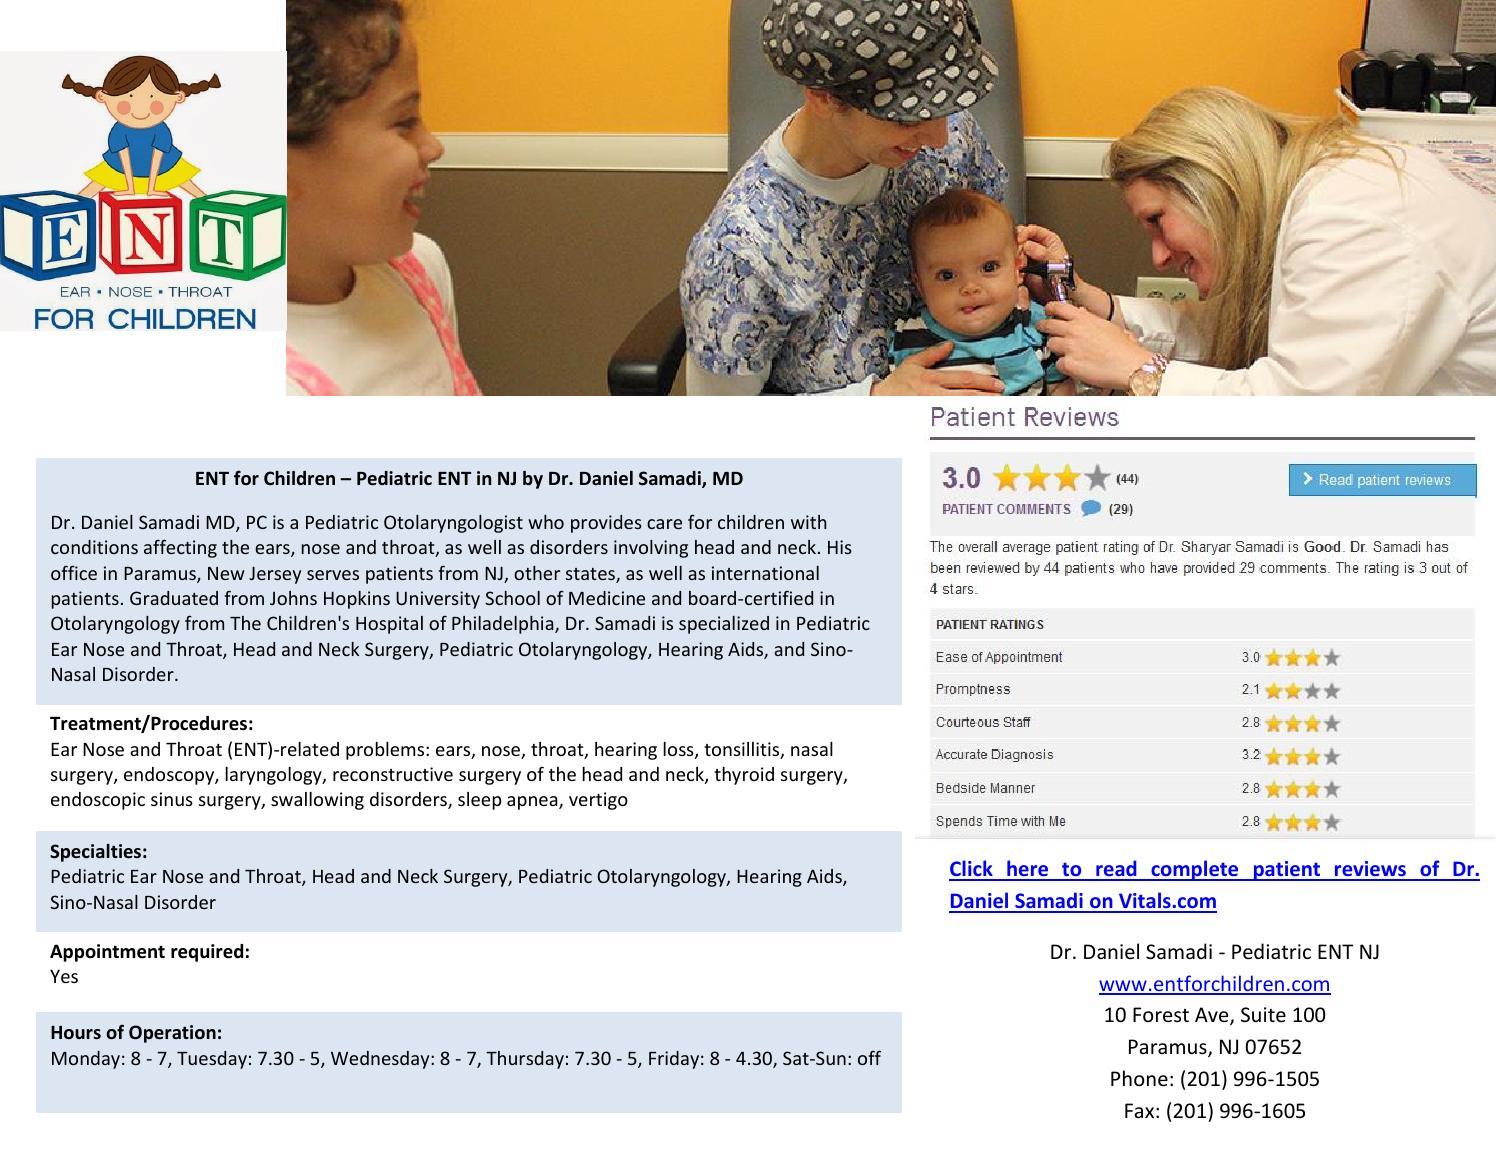 Pediatric ENT NJ by Dr Daniel Samadi by PediatricENT - issuu